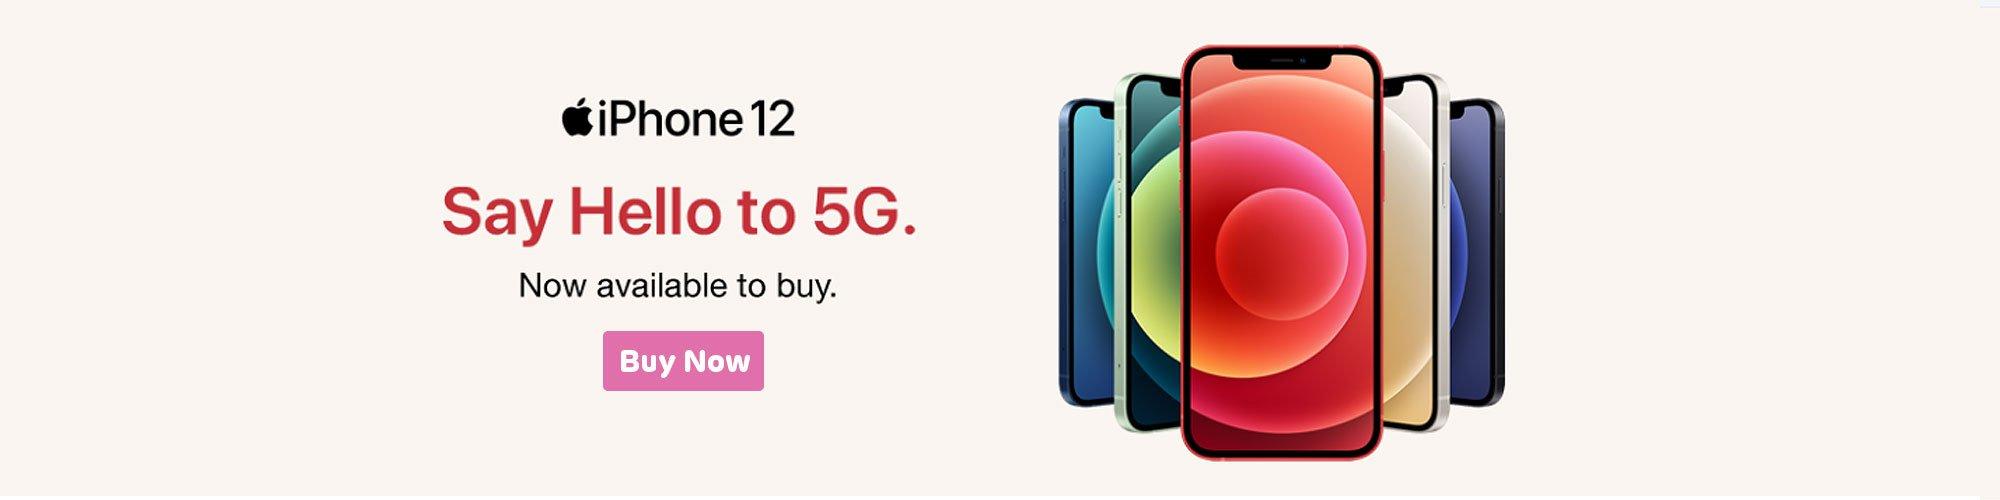 iPhone 12 5`g